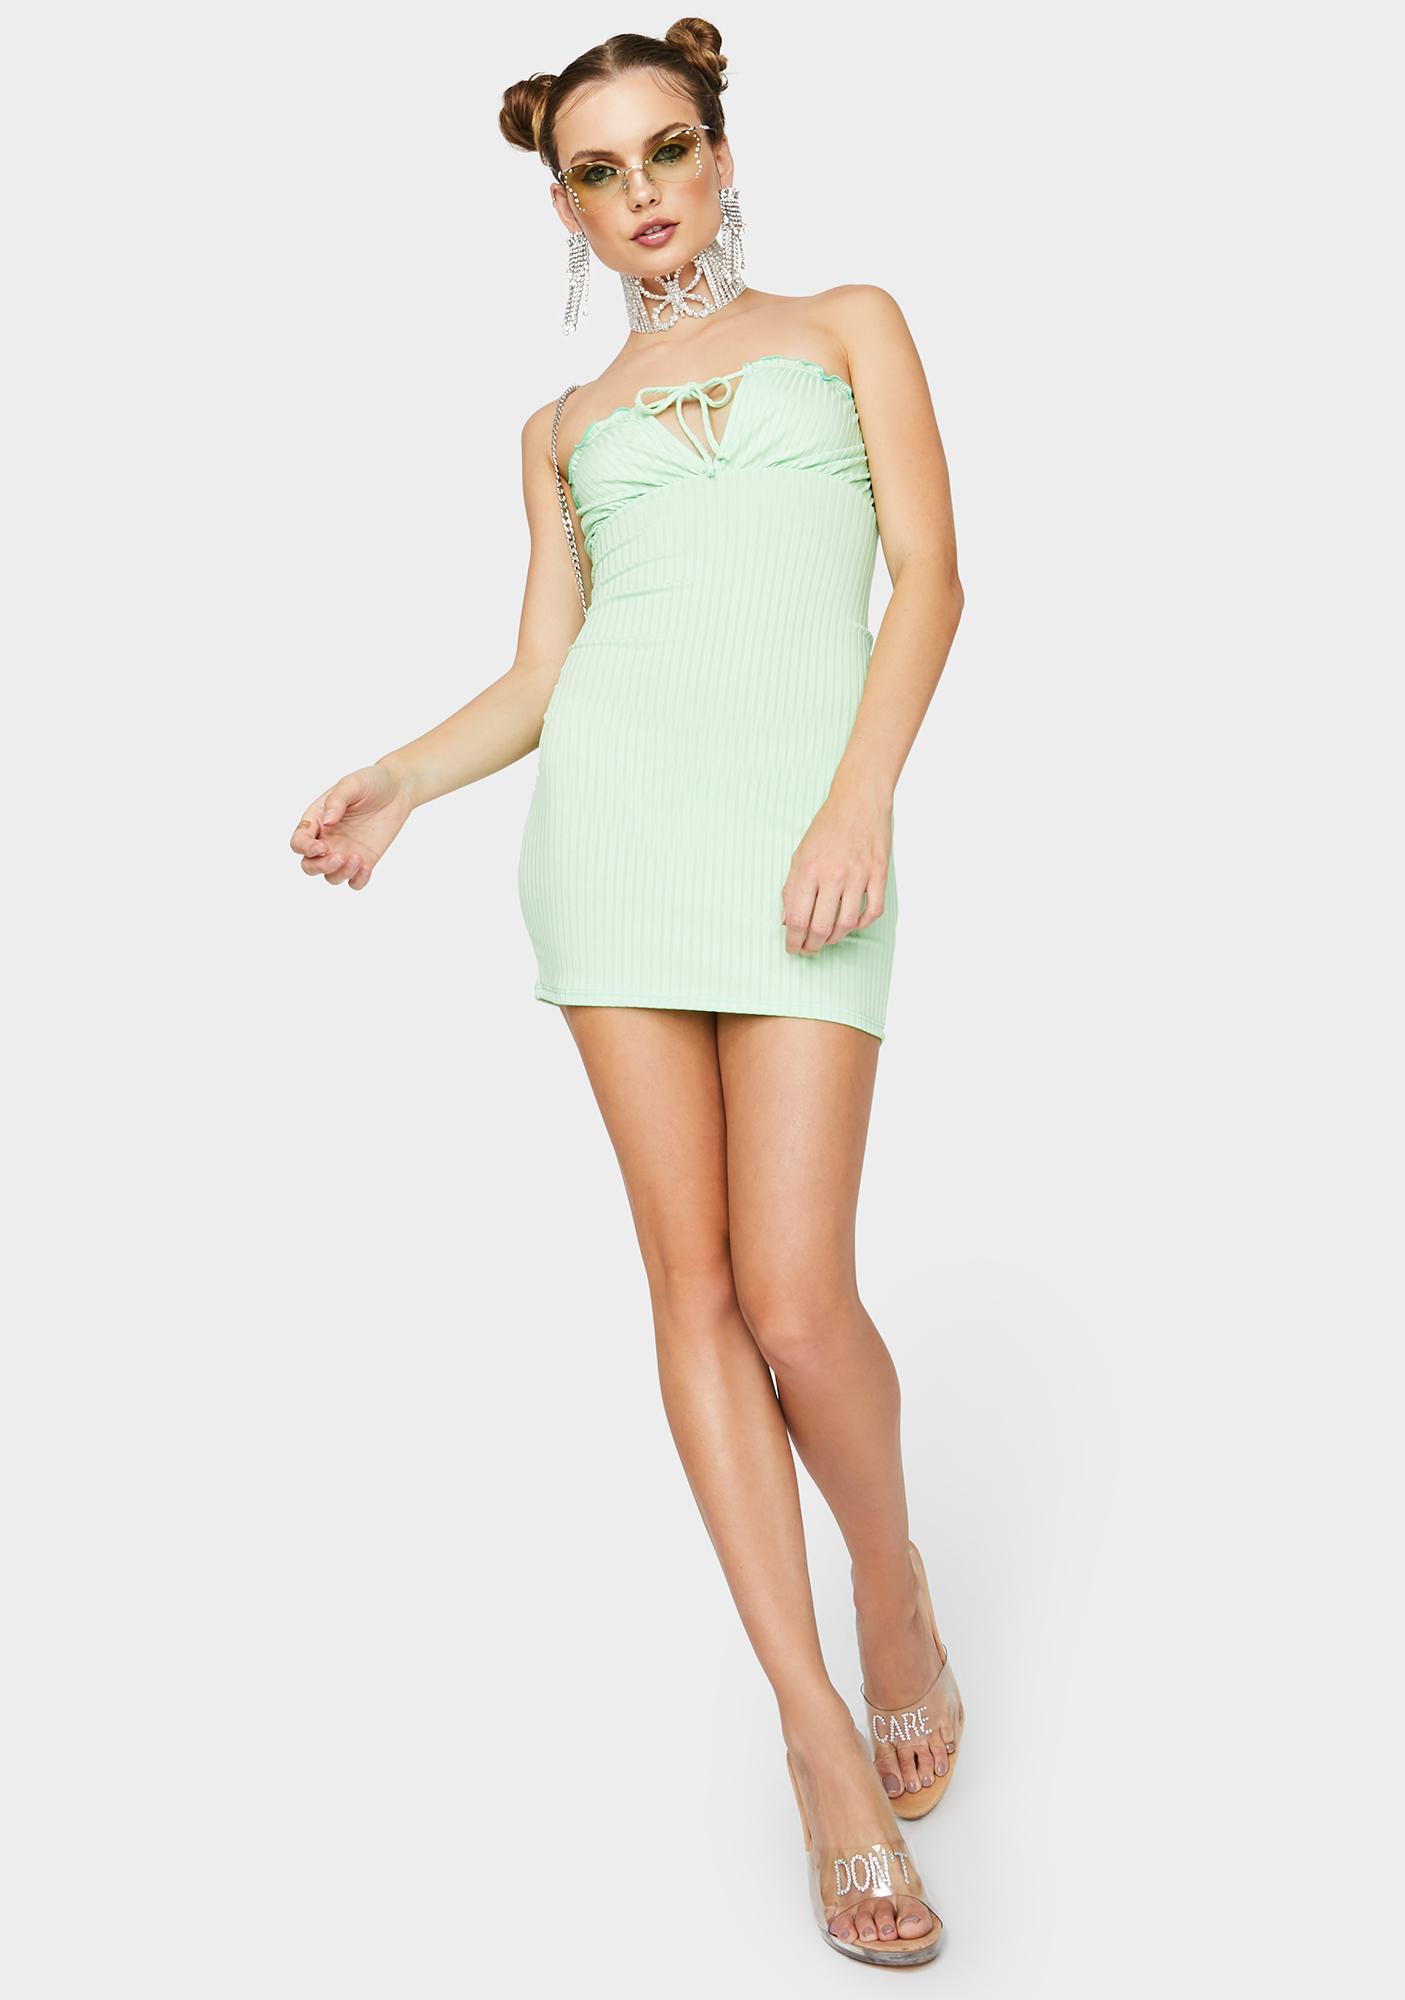 Can't Be Handled Mini Dress